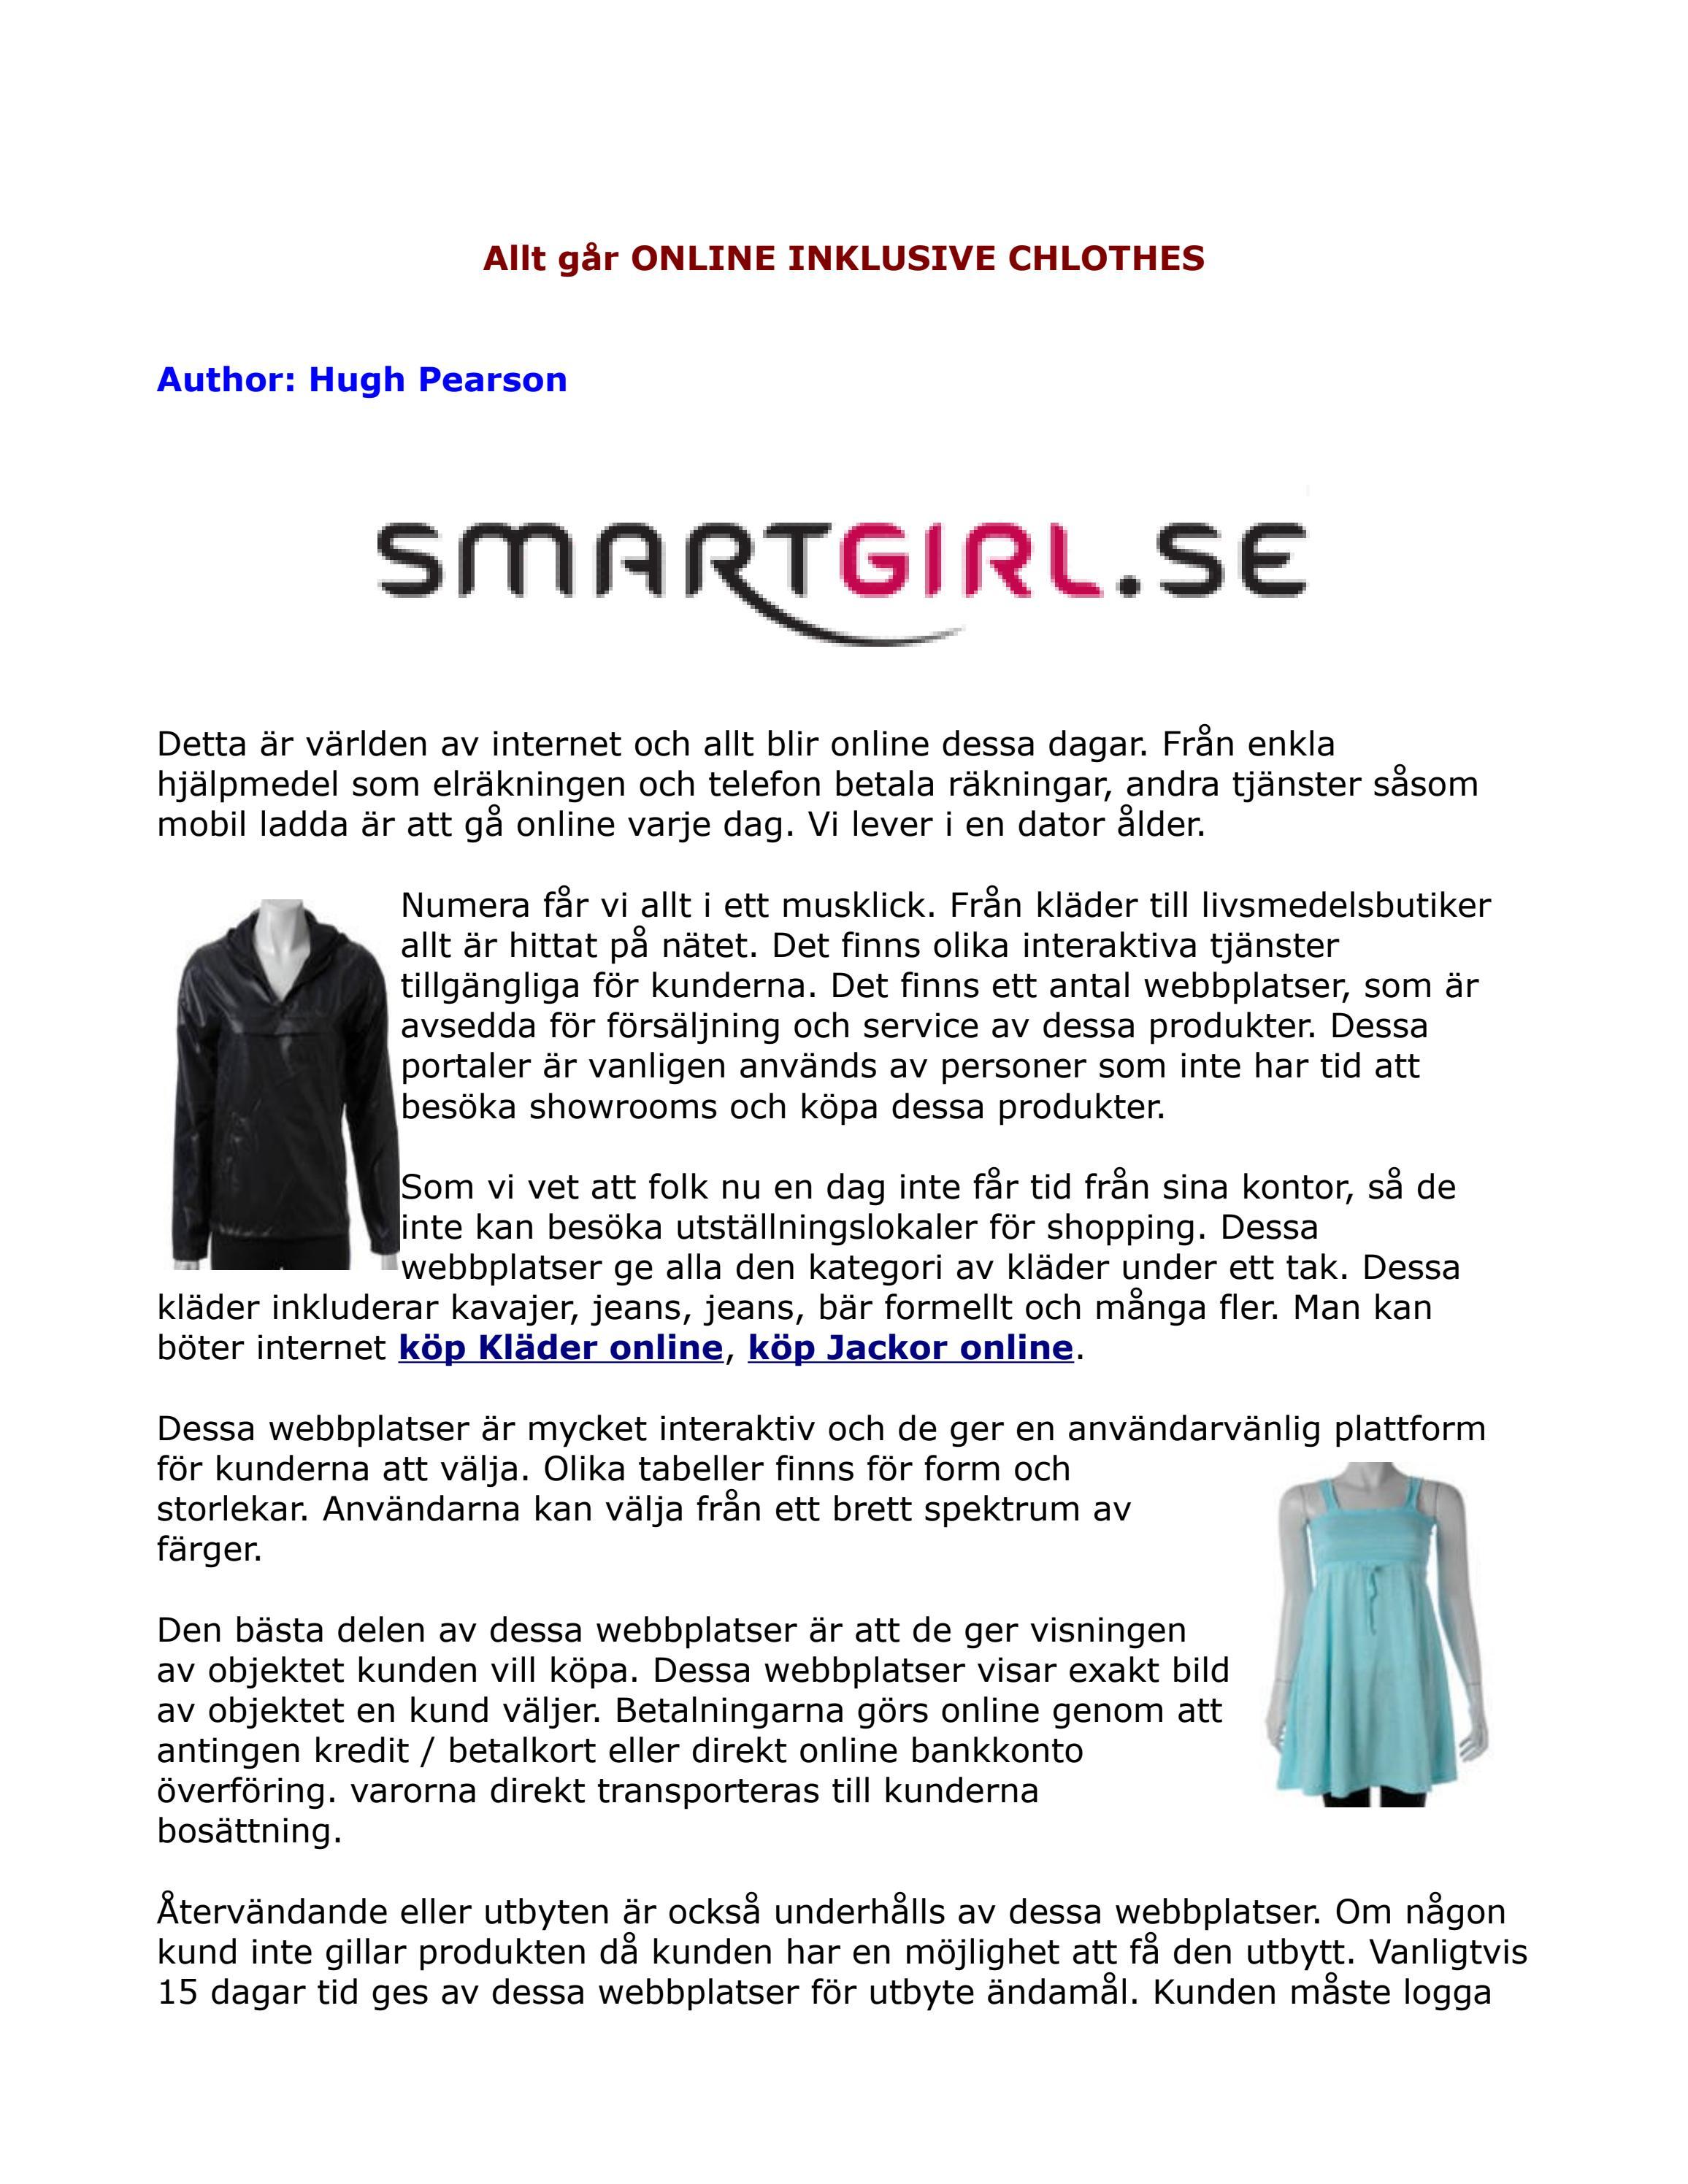 a7f7fa7cee6f köp Kläder online, köp klänningar online, köp Jackor online, köp Skor online  - SmartGirl.se by Hugh Pearson - issuu